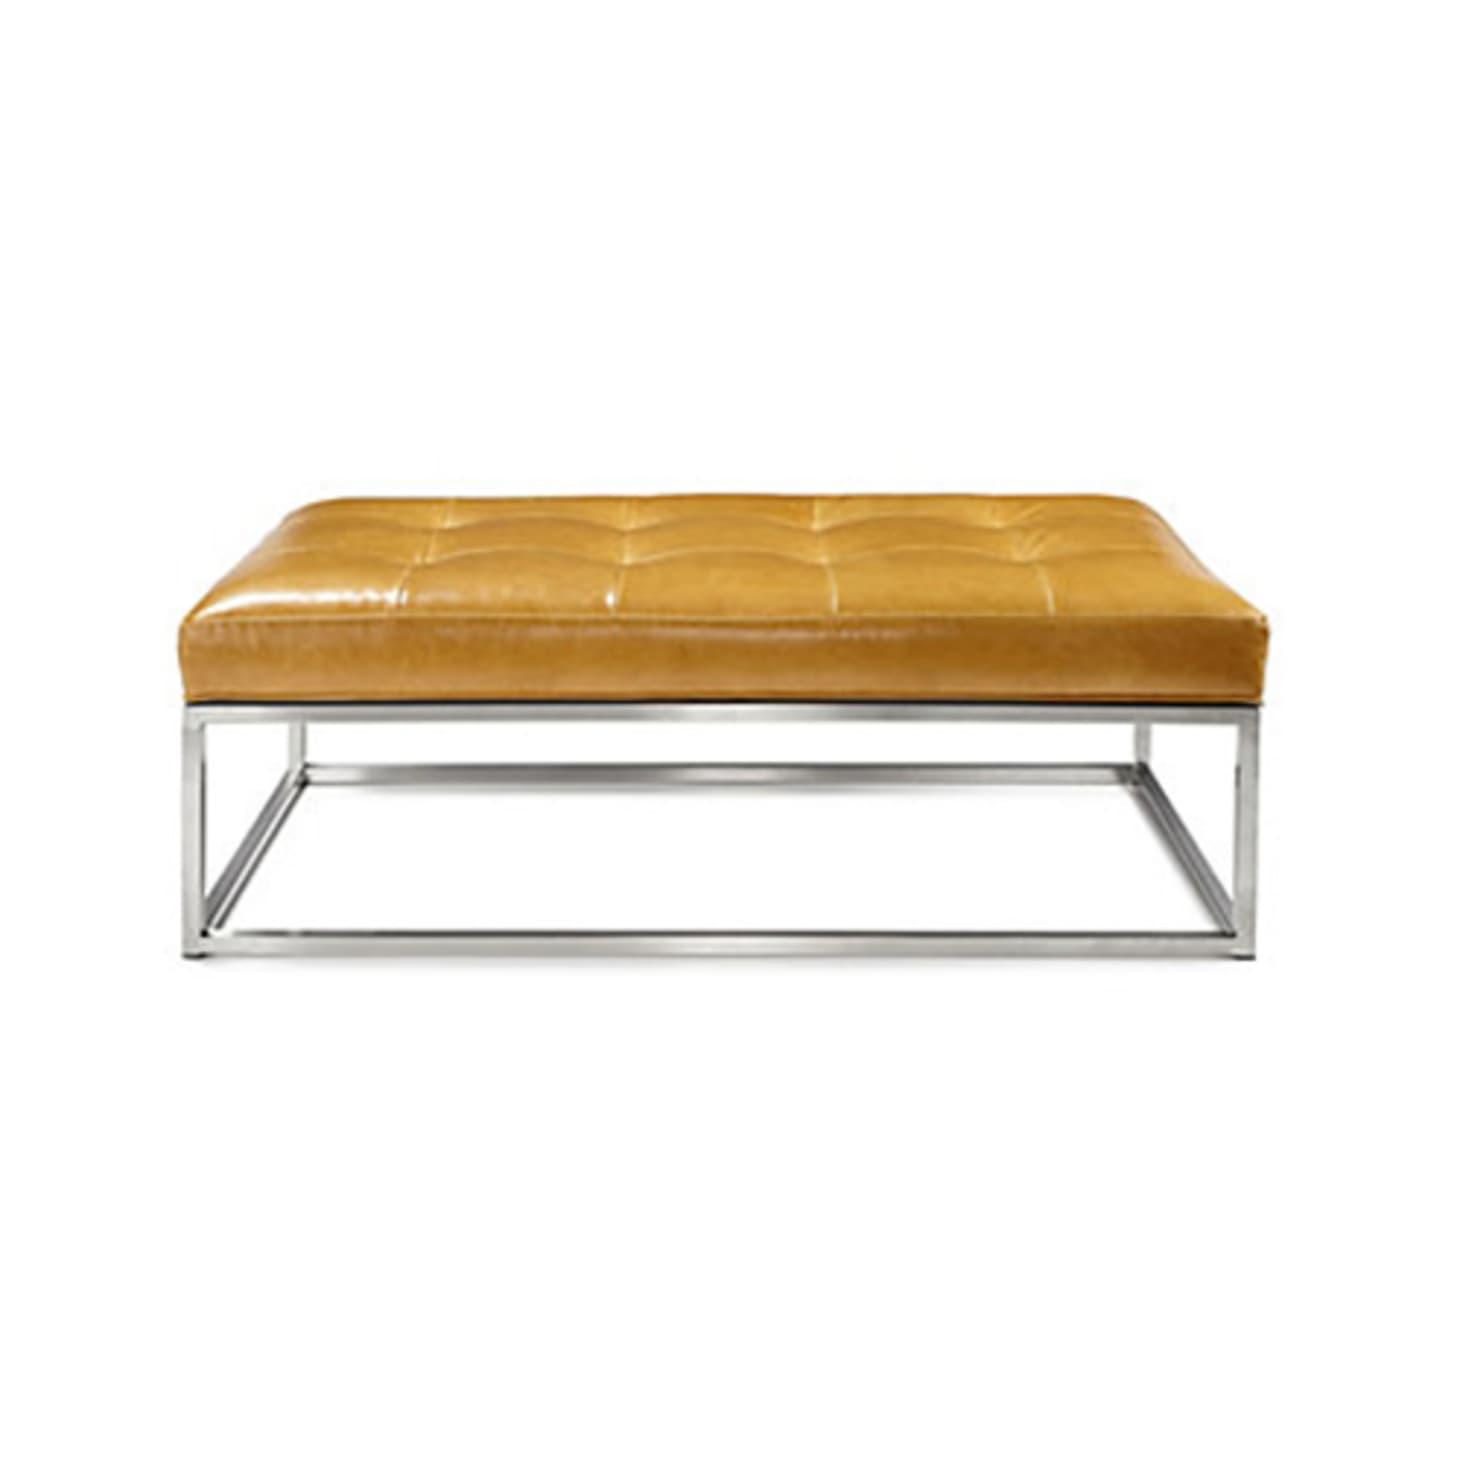 Astonishing Double Duty 12 Ottoman Plus Coffee Table Hybrids Apartment Evergreenethics Interior Chair Design Evergreenethicsorg